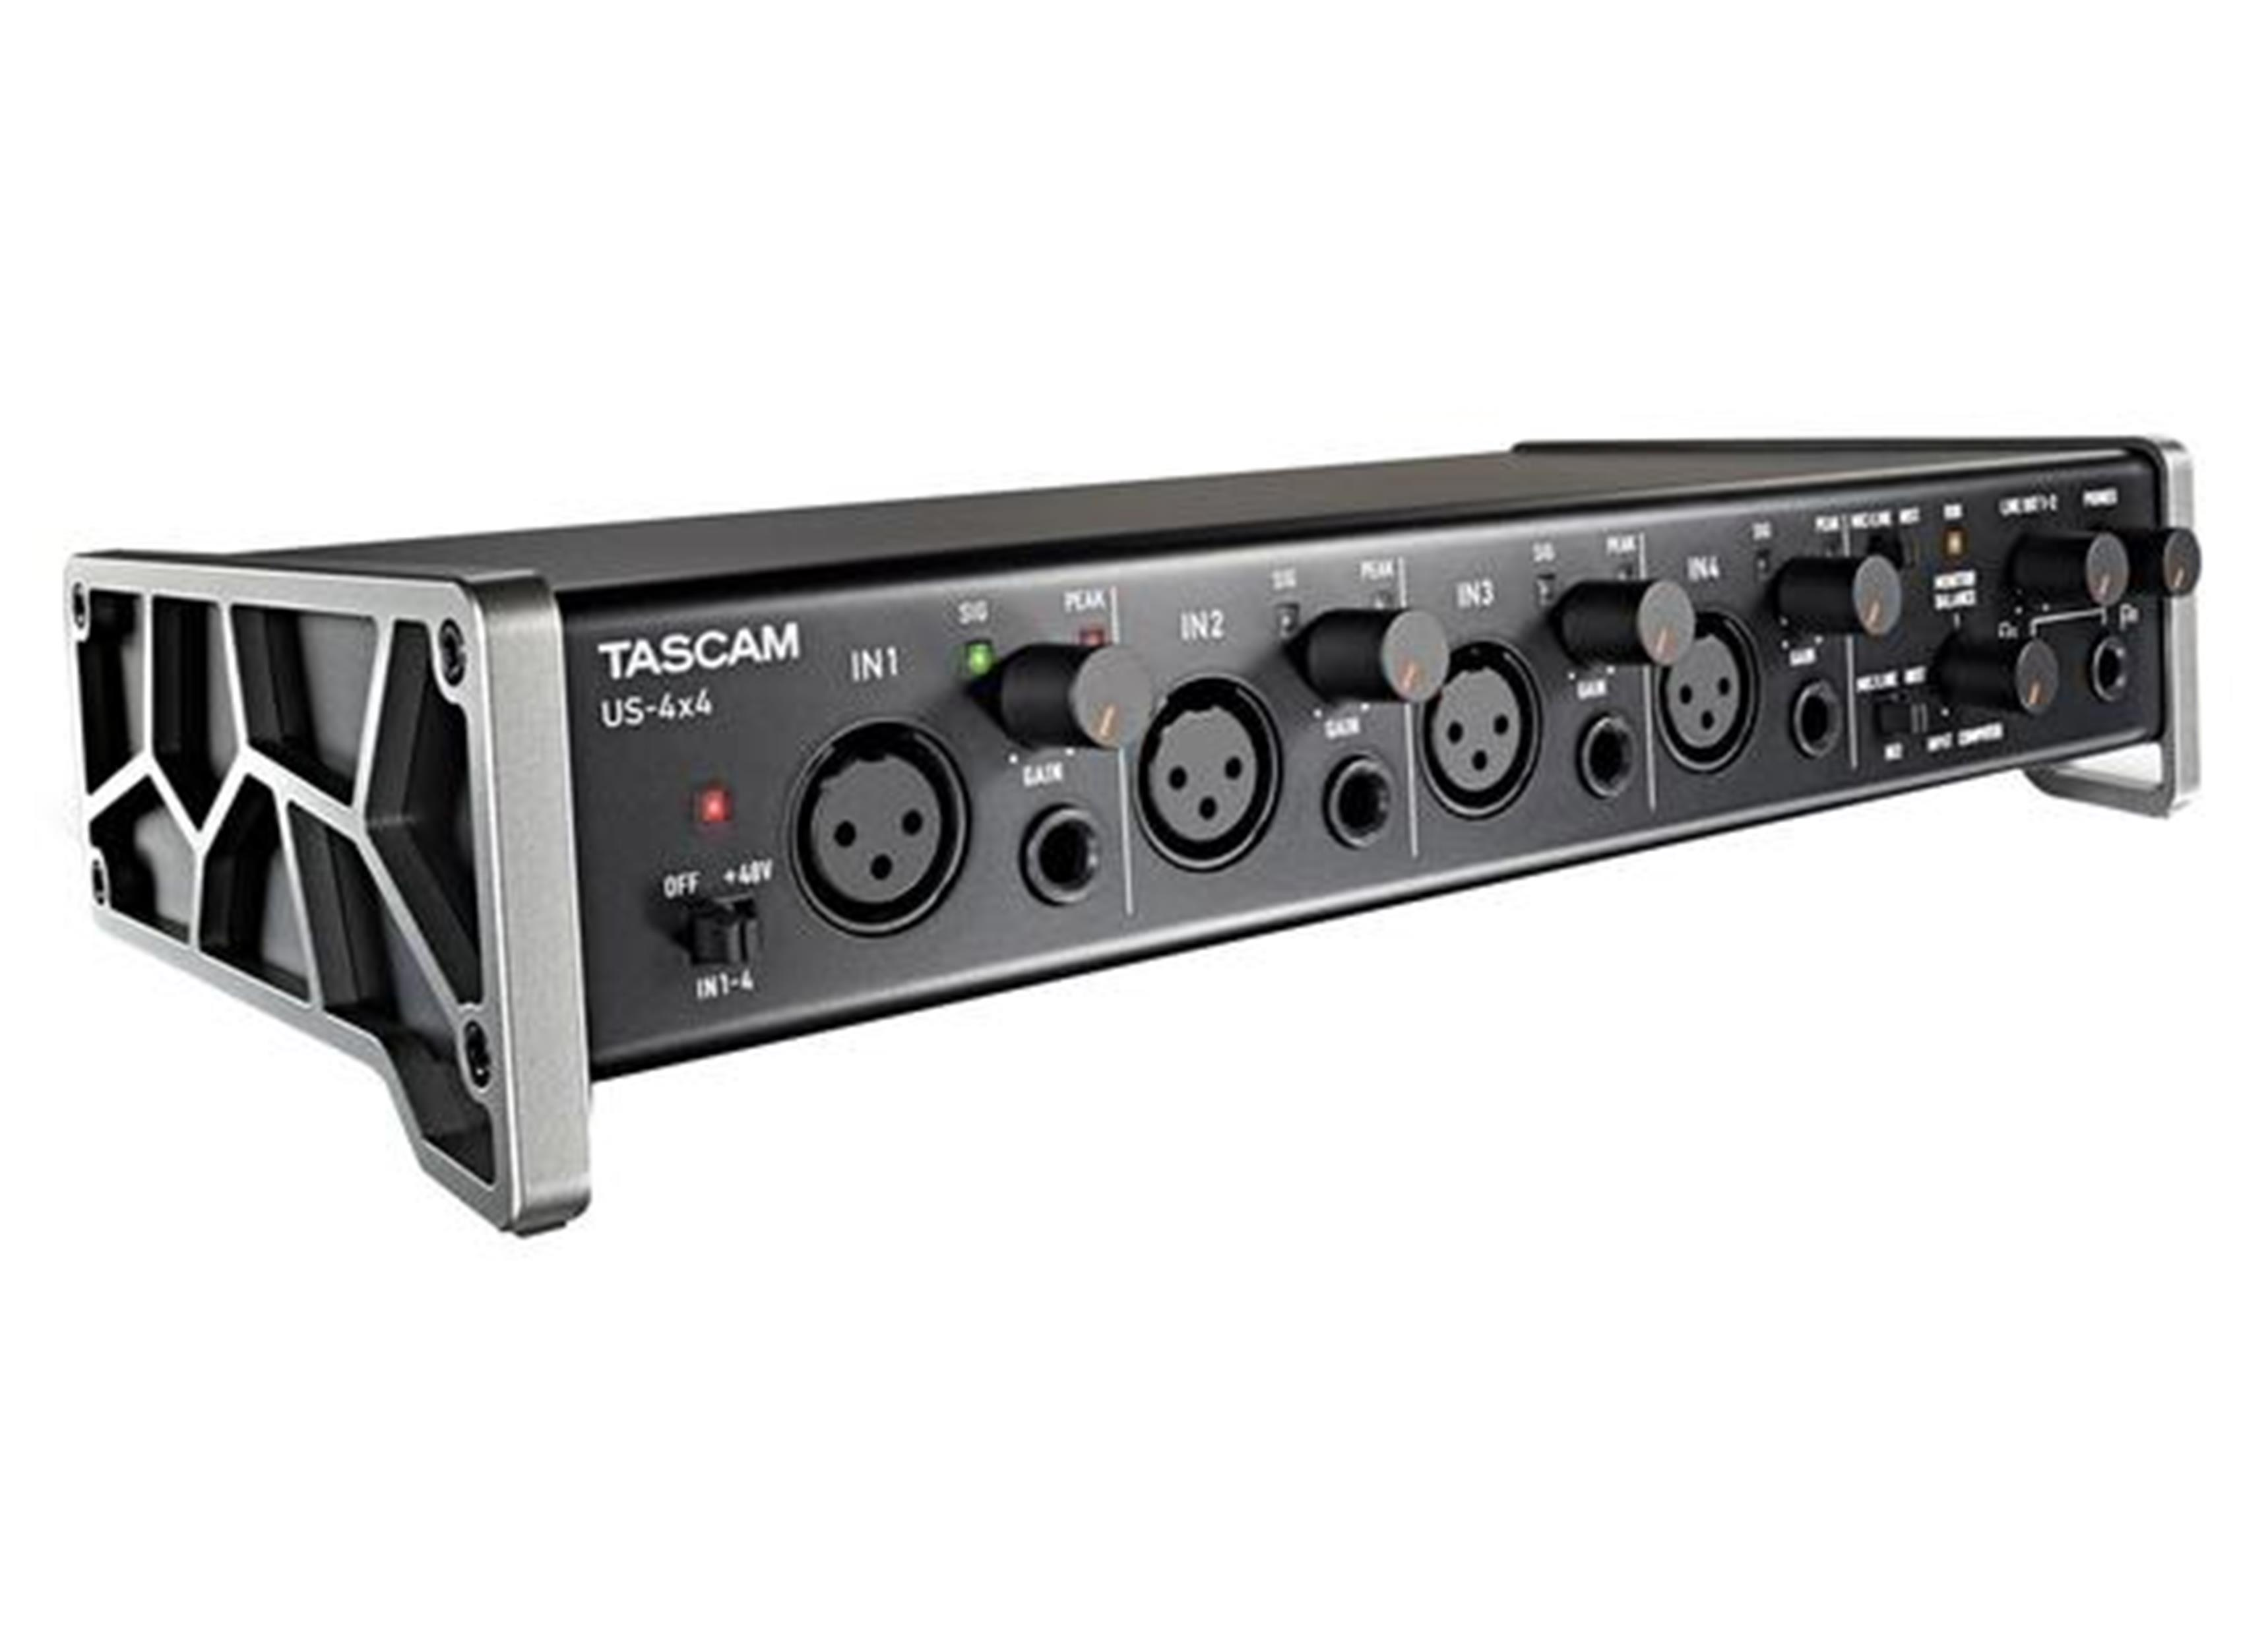 TASCAM-US-4X4-SCHEDA-AUDIO-sku-21644